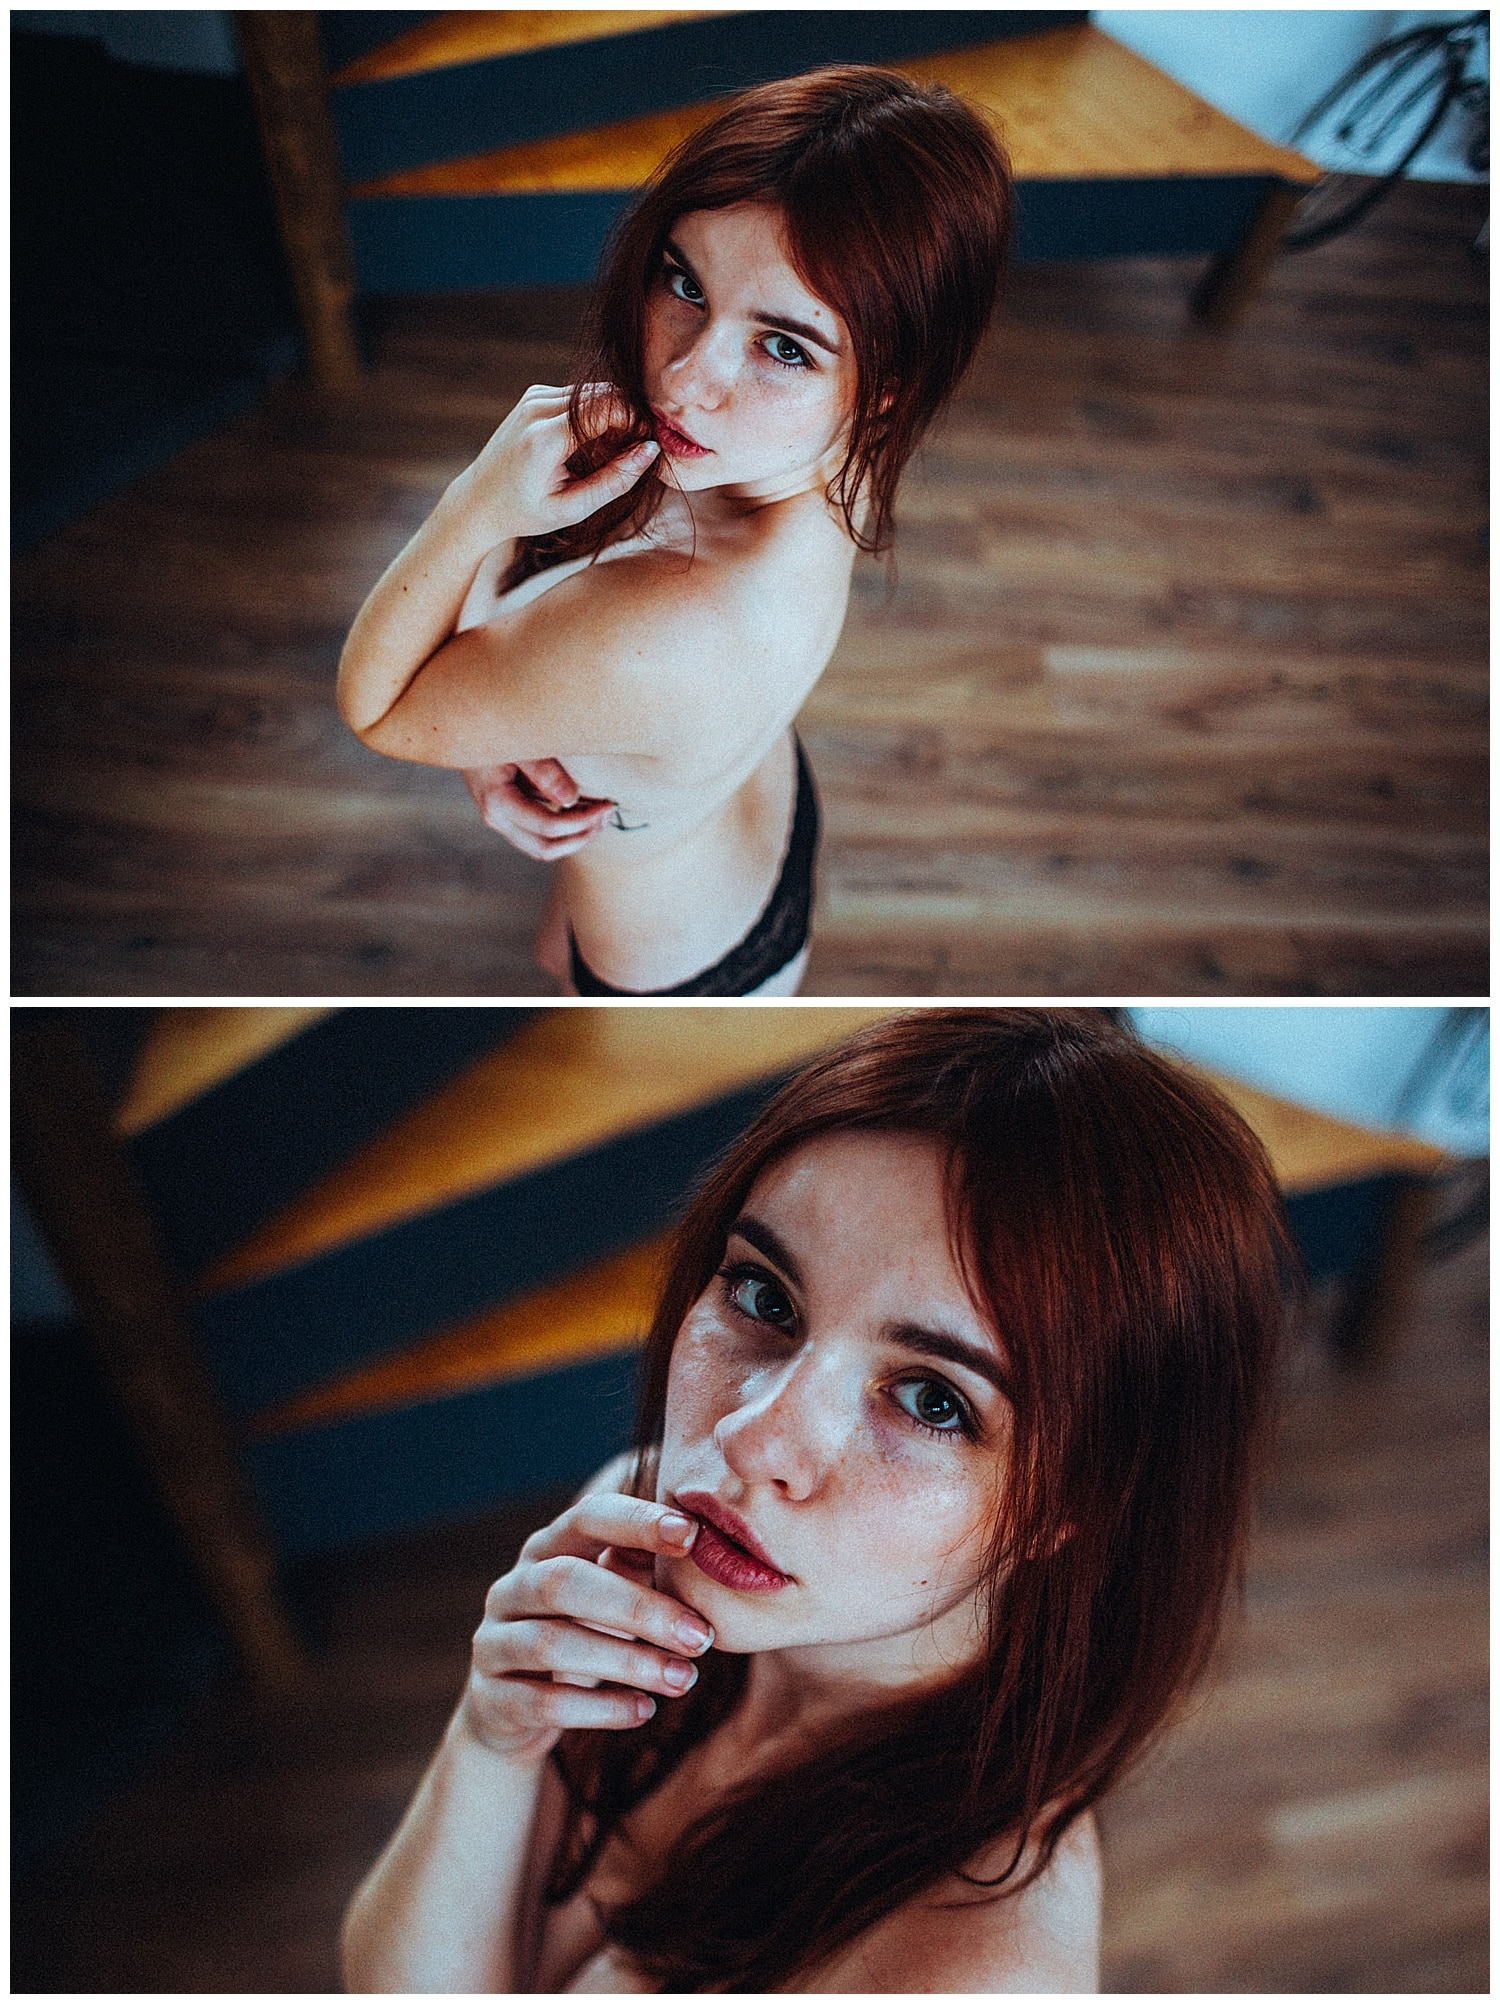 Caro_Home_31_01_2017-2460